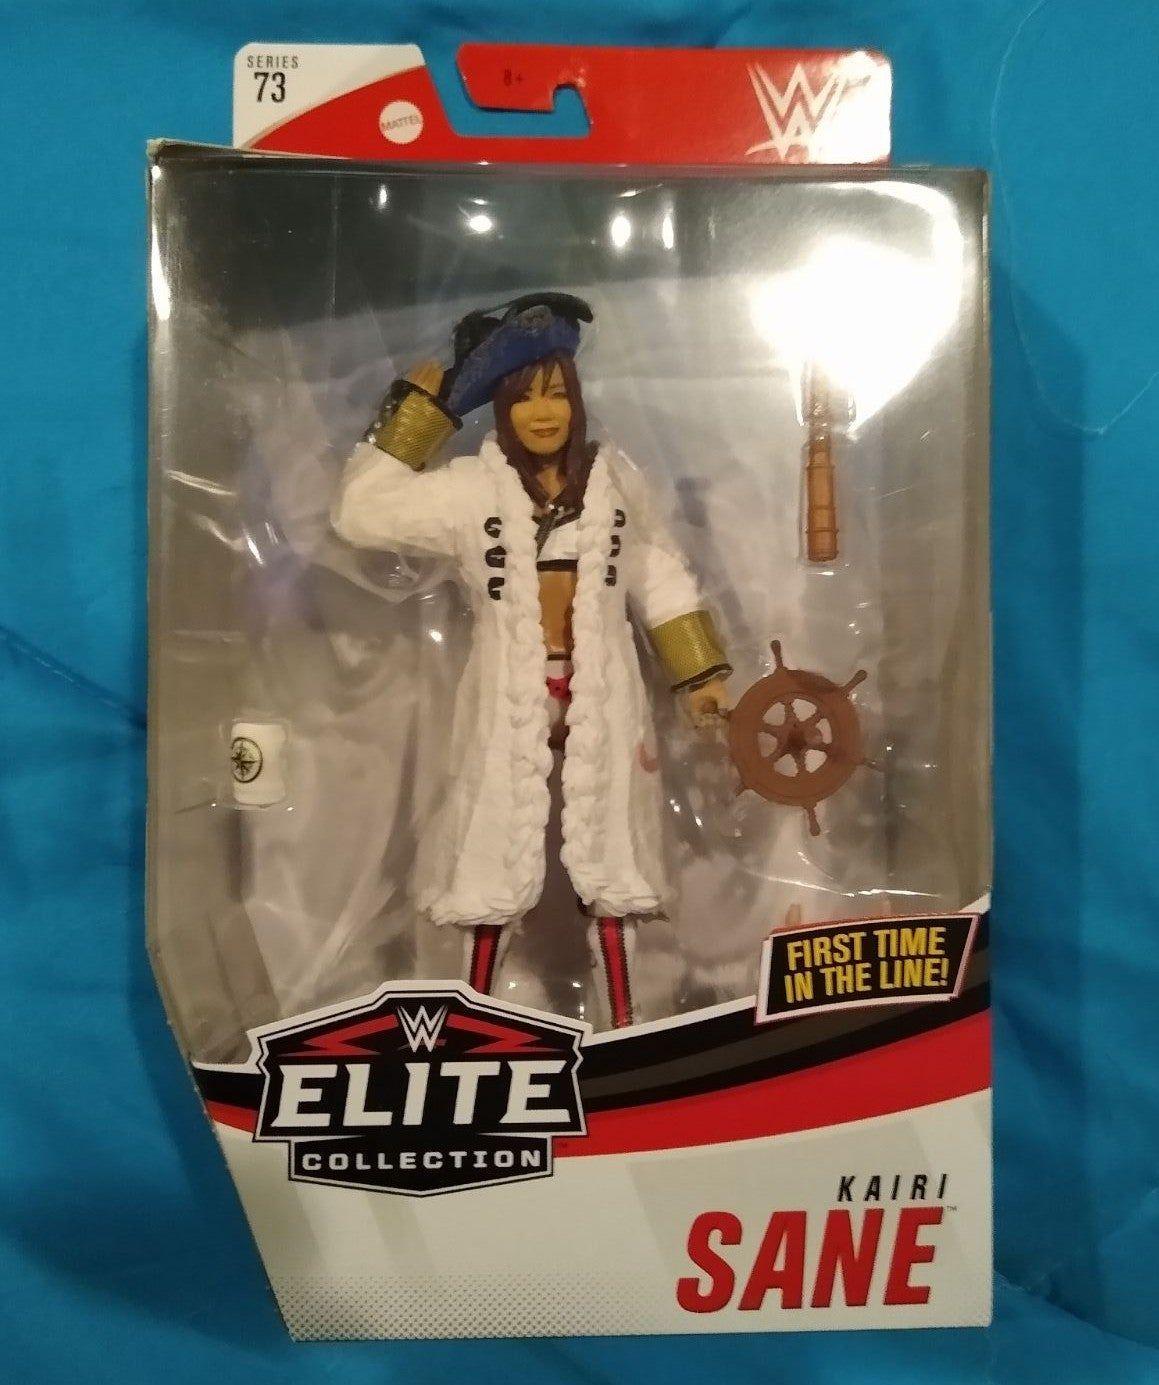 Brand new figure. Mint in box. Elite 73 Kairi Sane. Comes